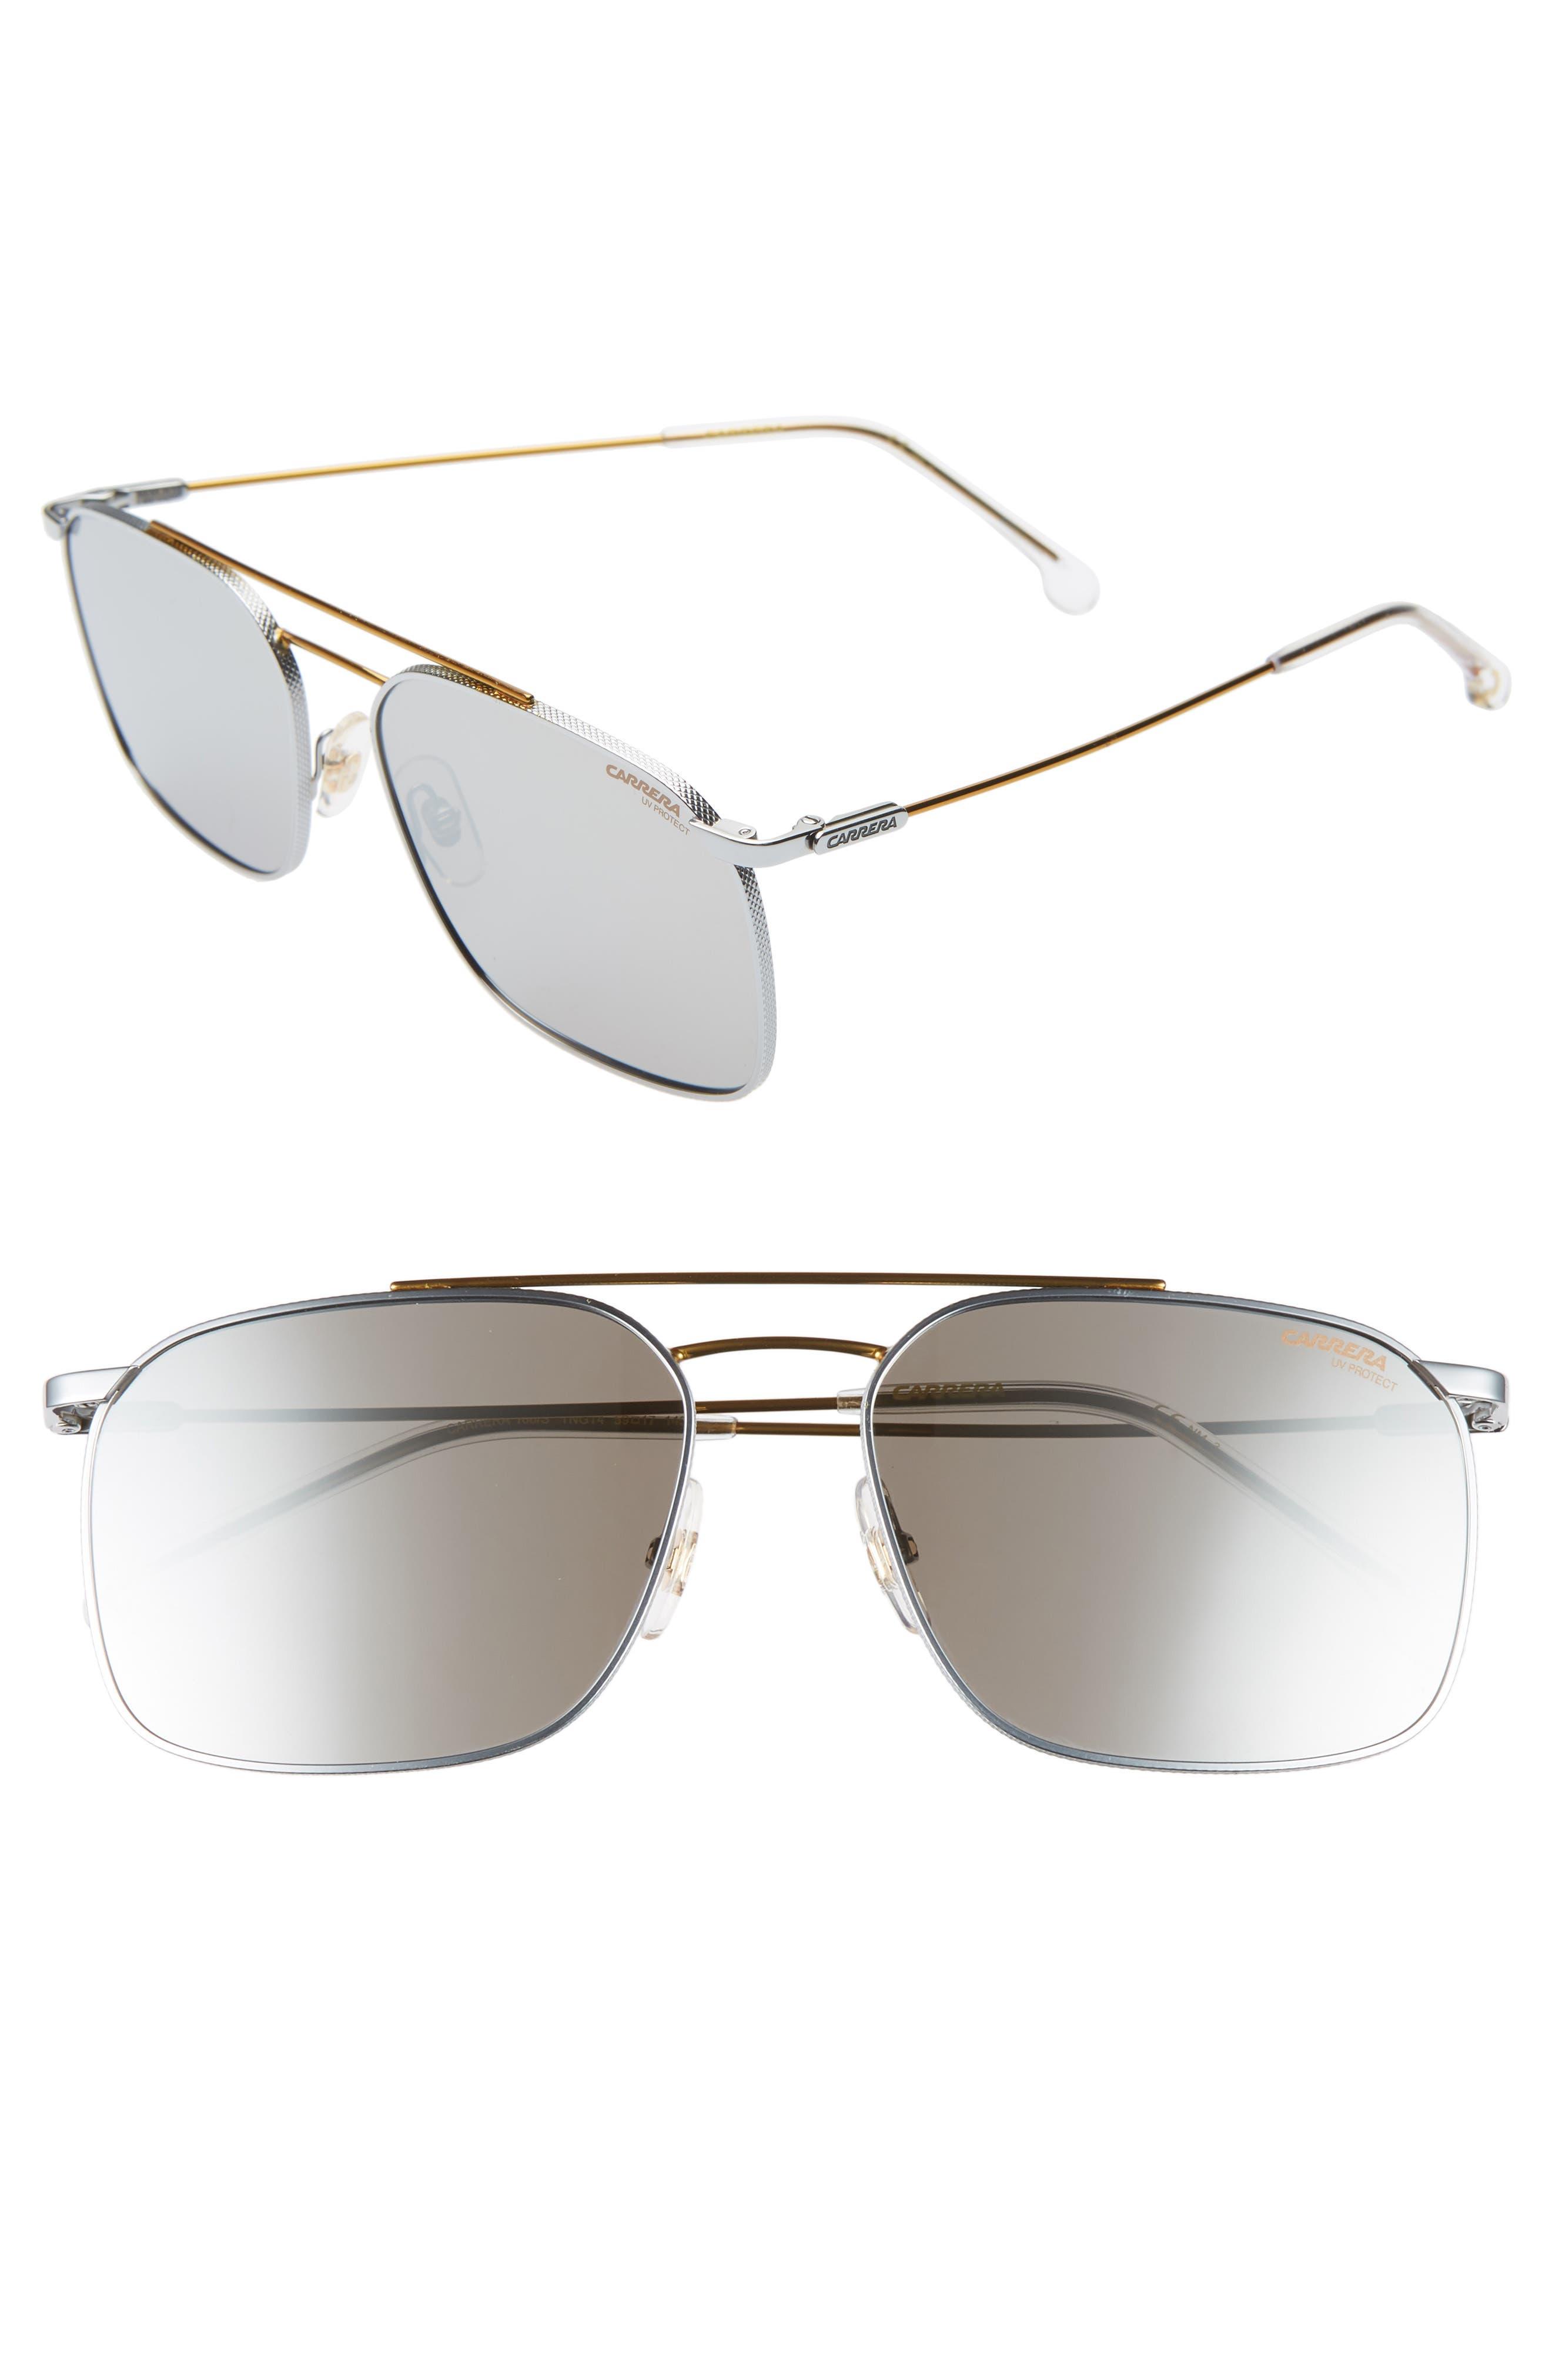 Carrera Eyewear 5m Aviator Sunglasses - Palladium Gold